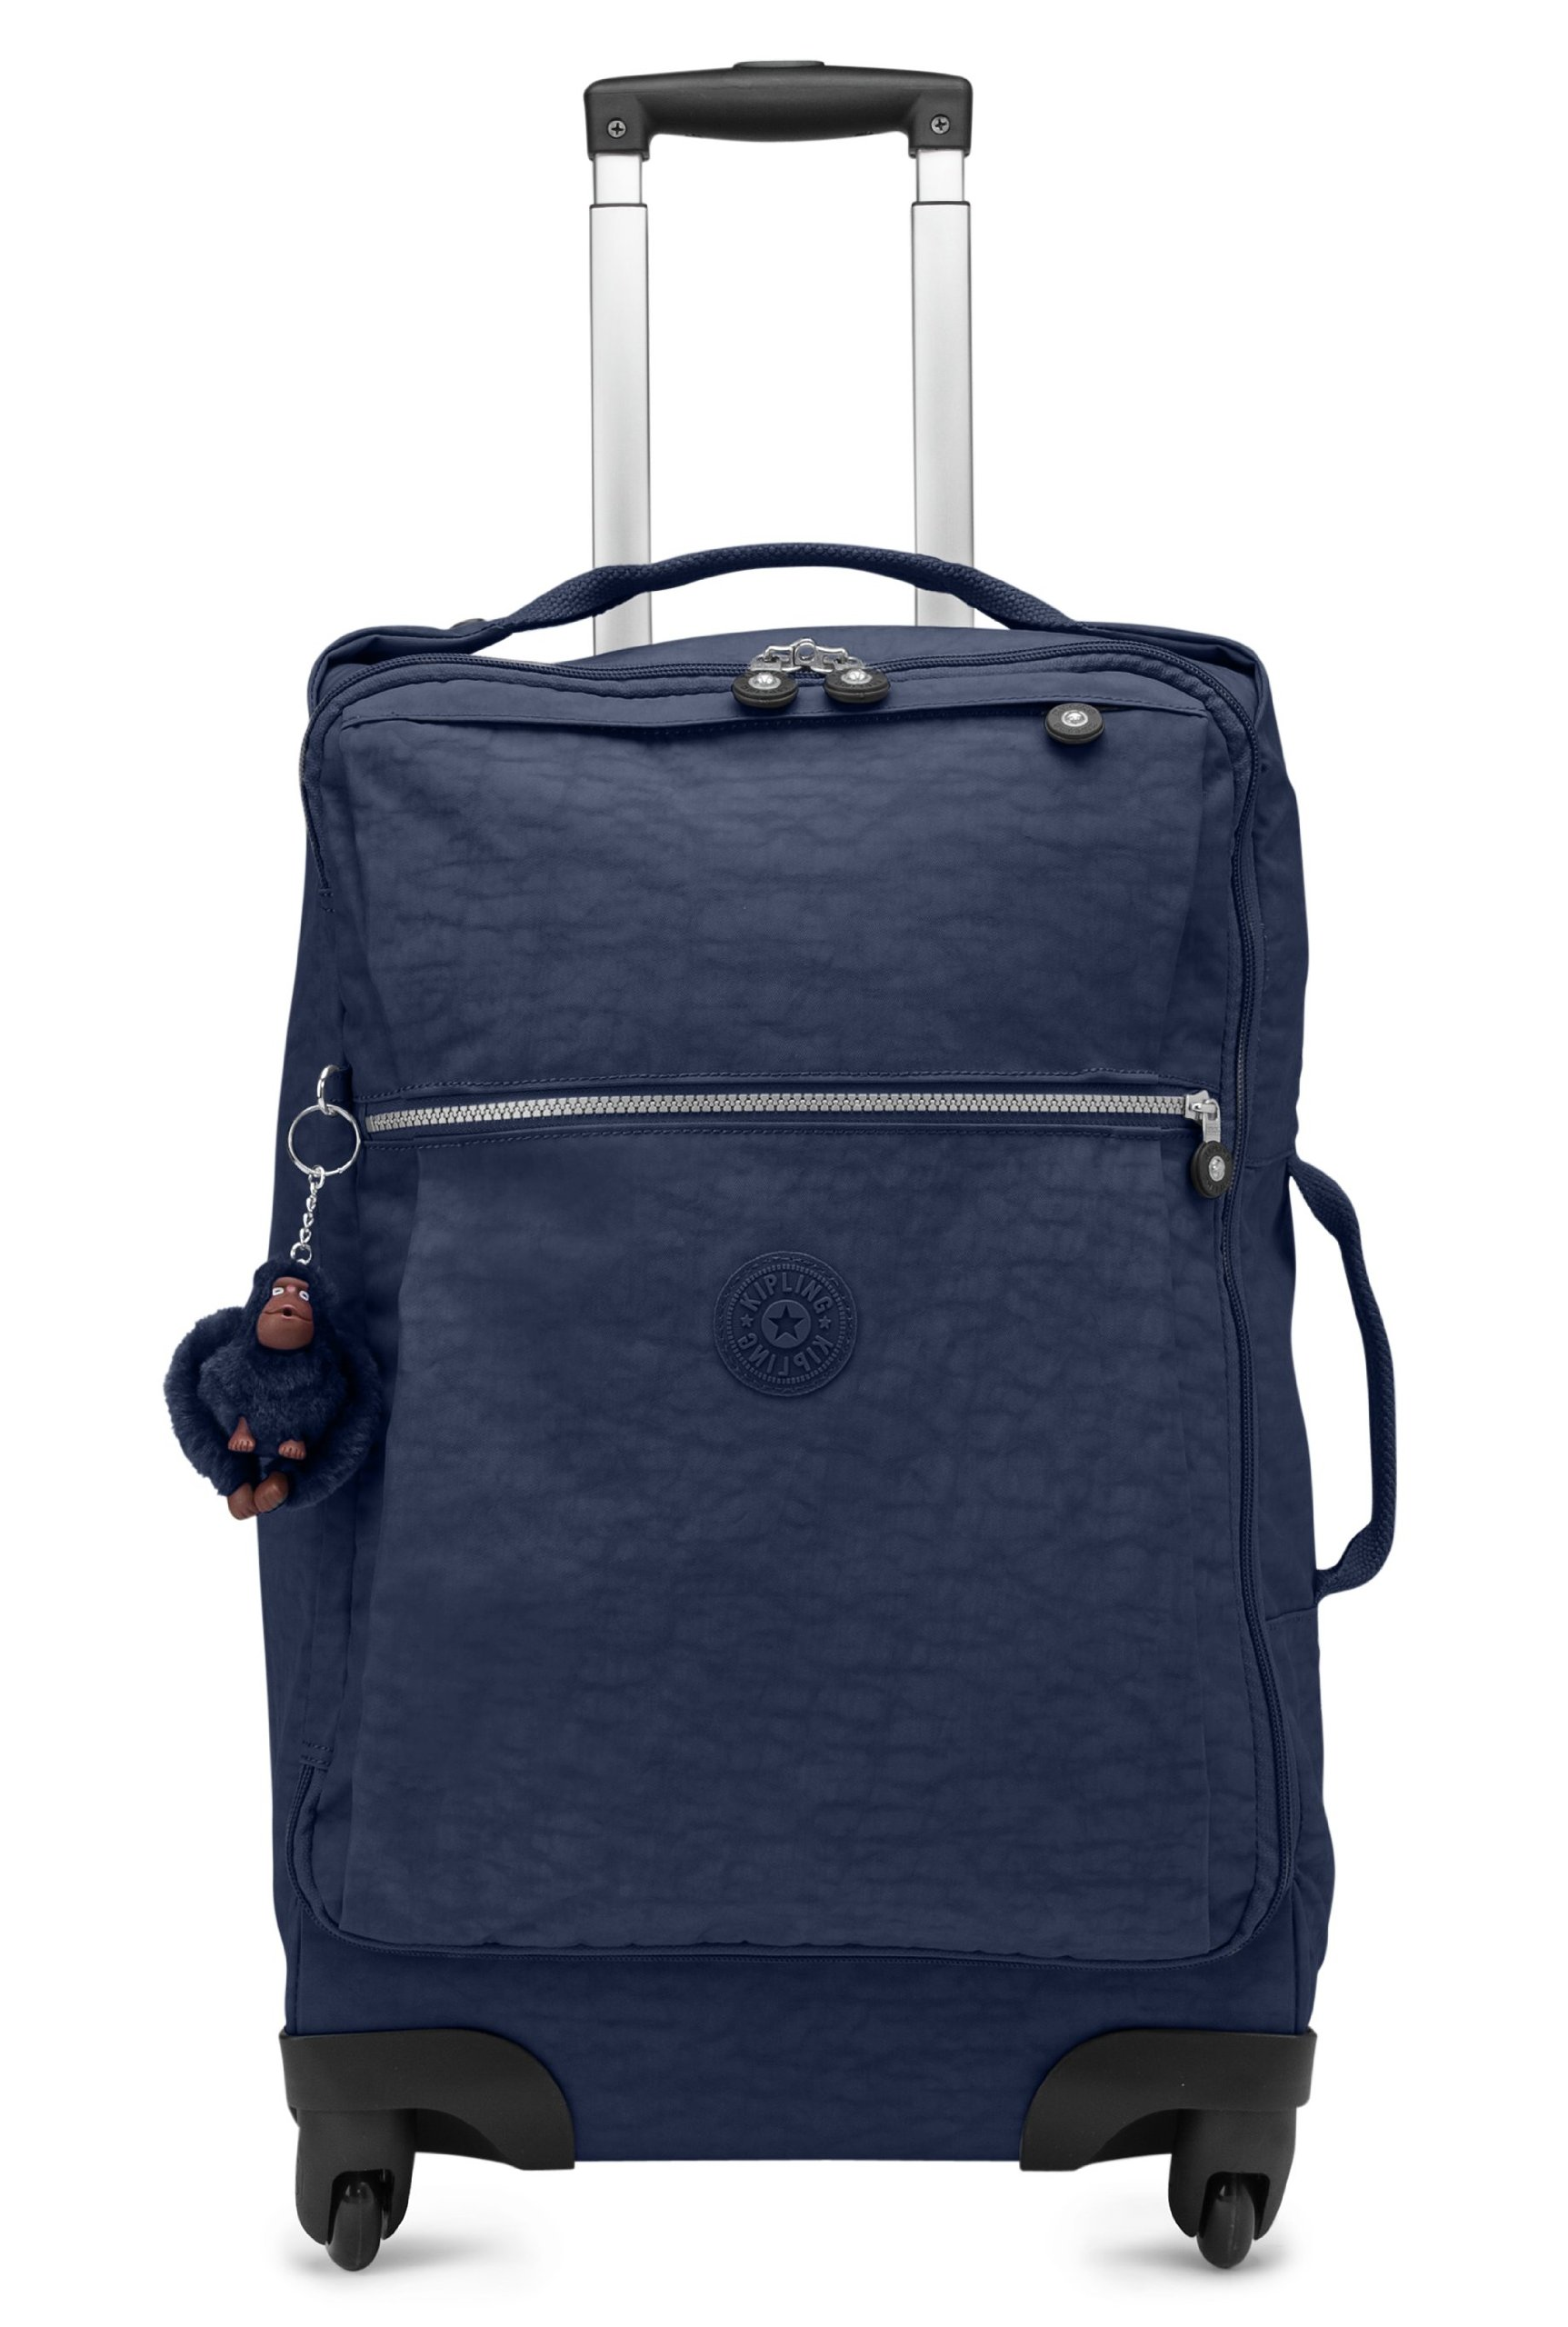 Kipling Darcey Medium Wheeled Luggage